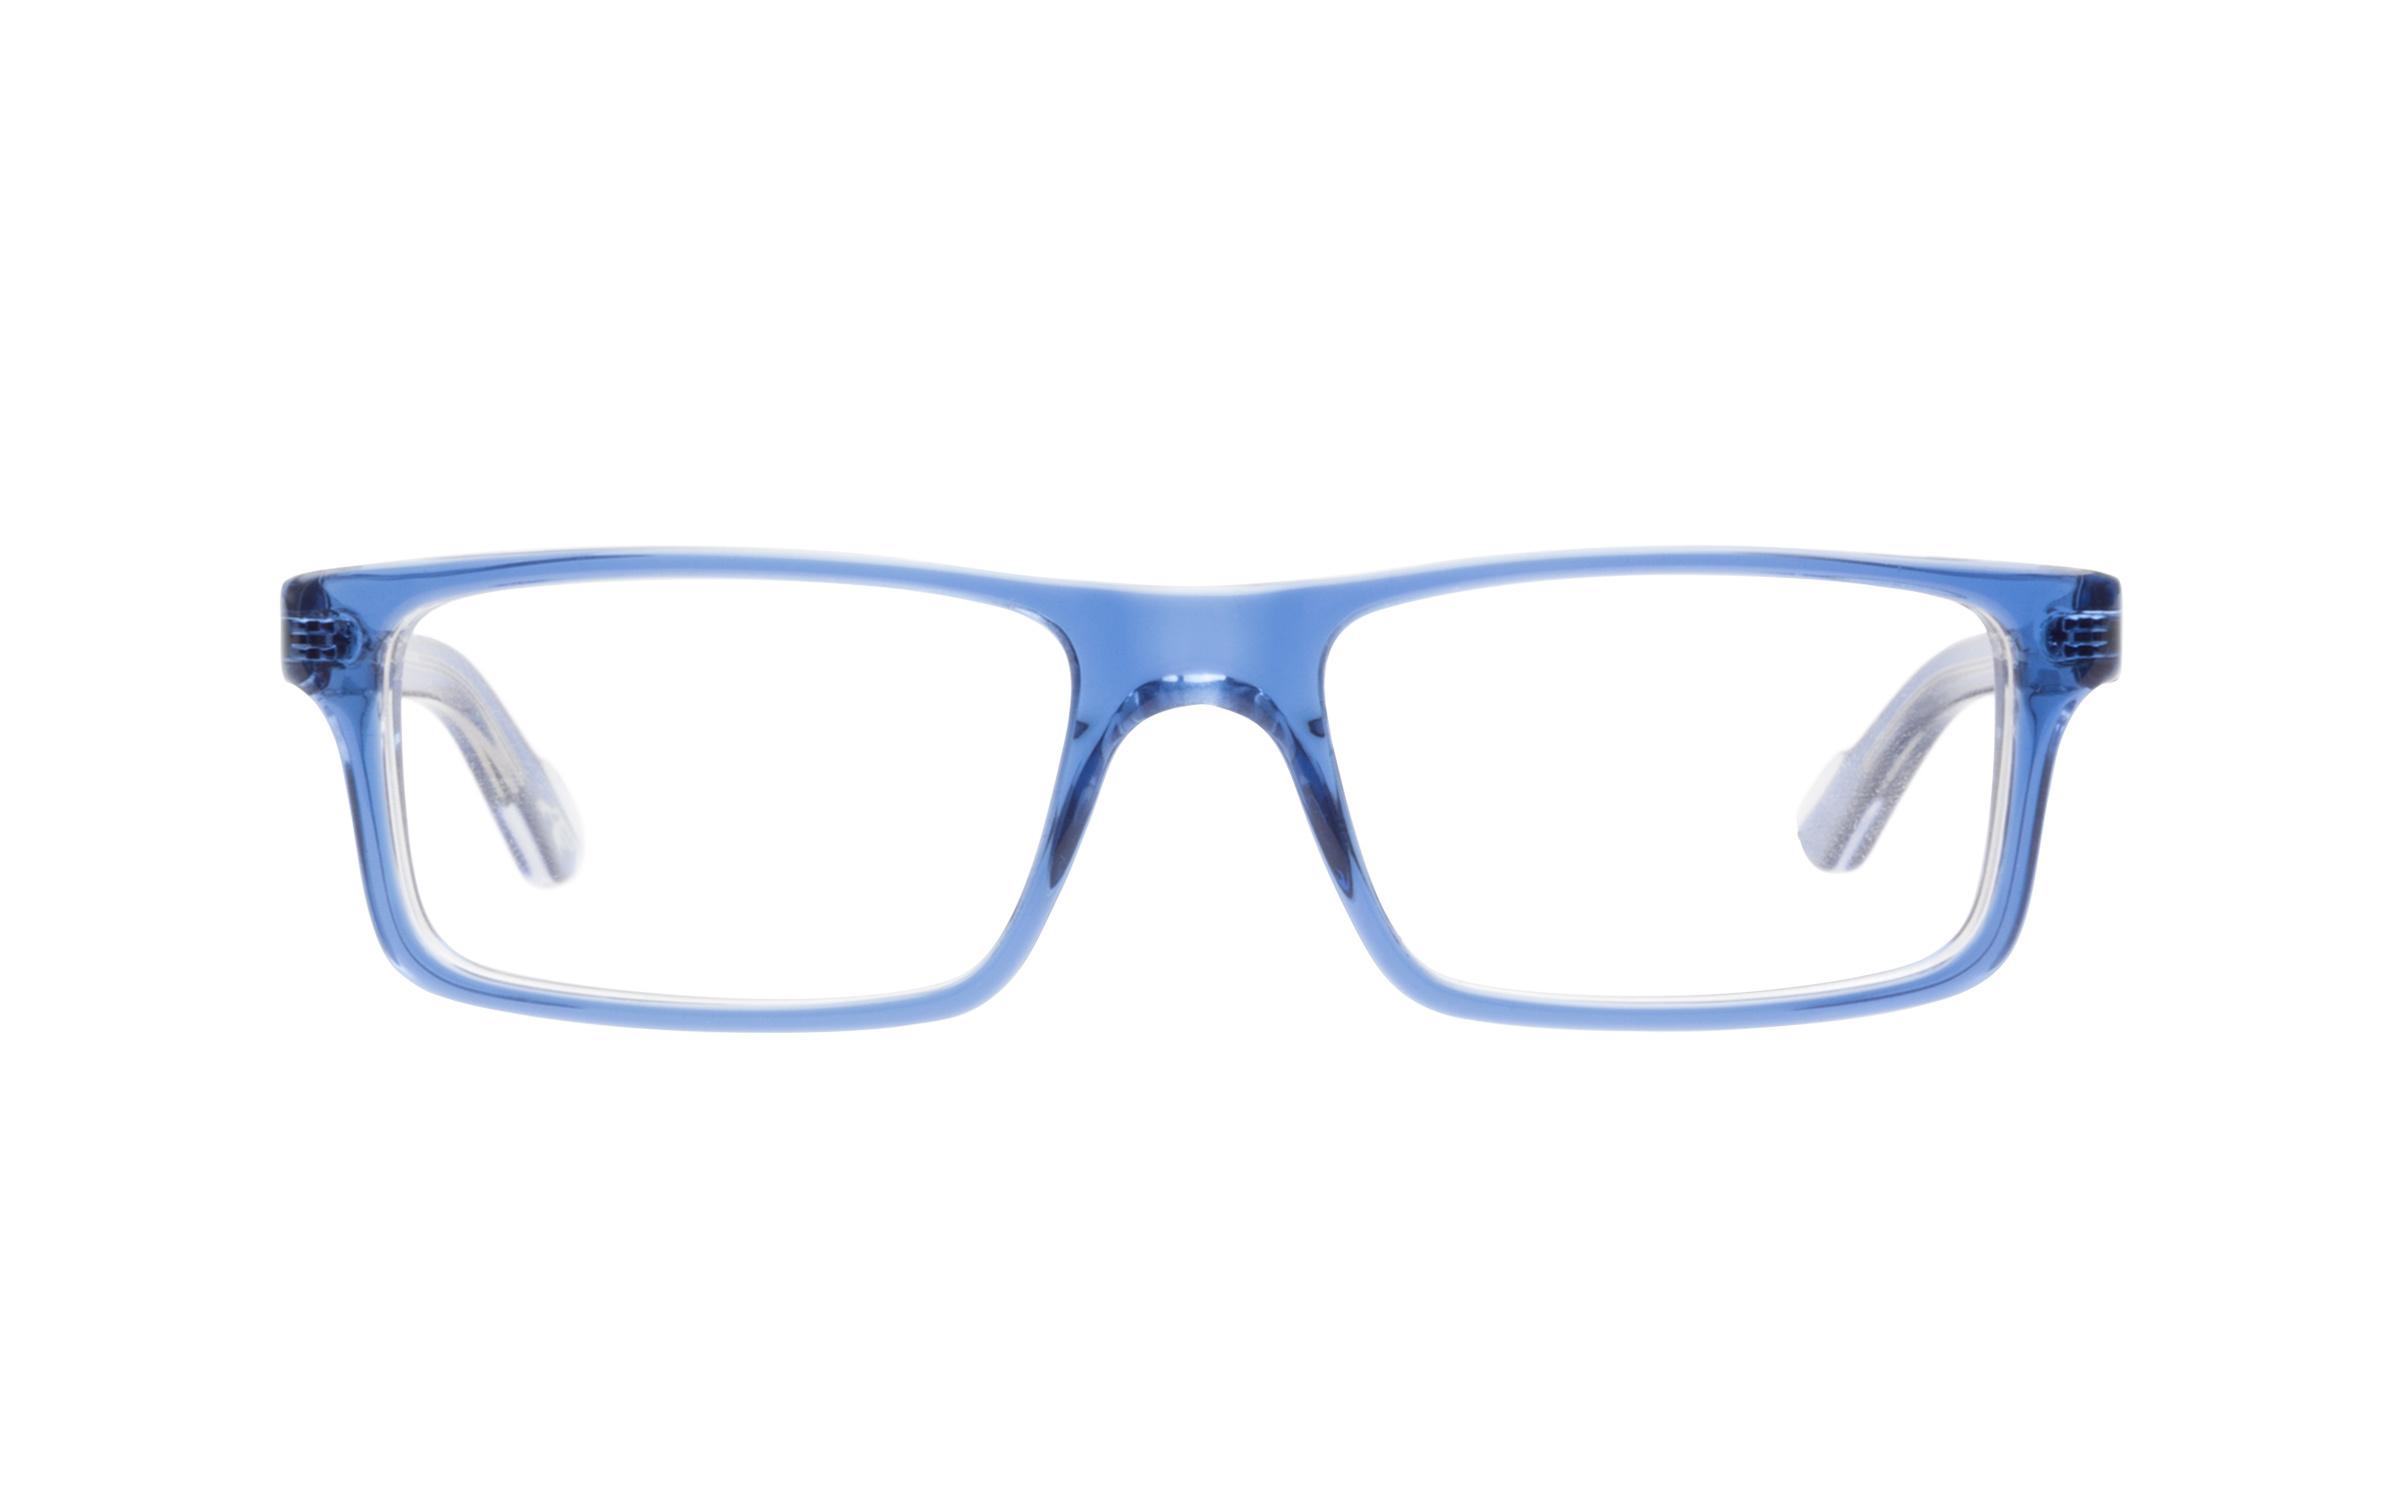 http://www.coastal.com/ - Luxottica Arnette 7060 Lo-Fi 1130 Eyeglasses and Frame in Translucent Blue Brown   Acetate – Online Coastal